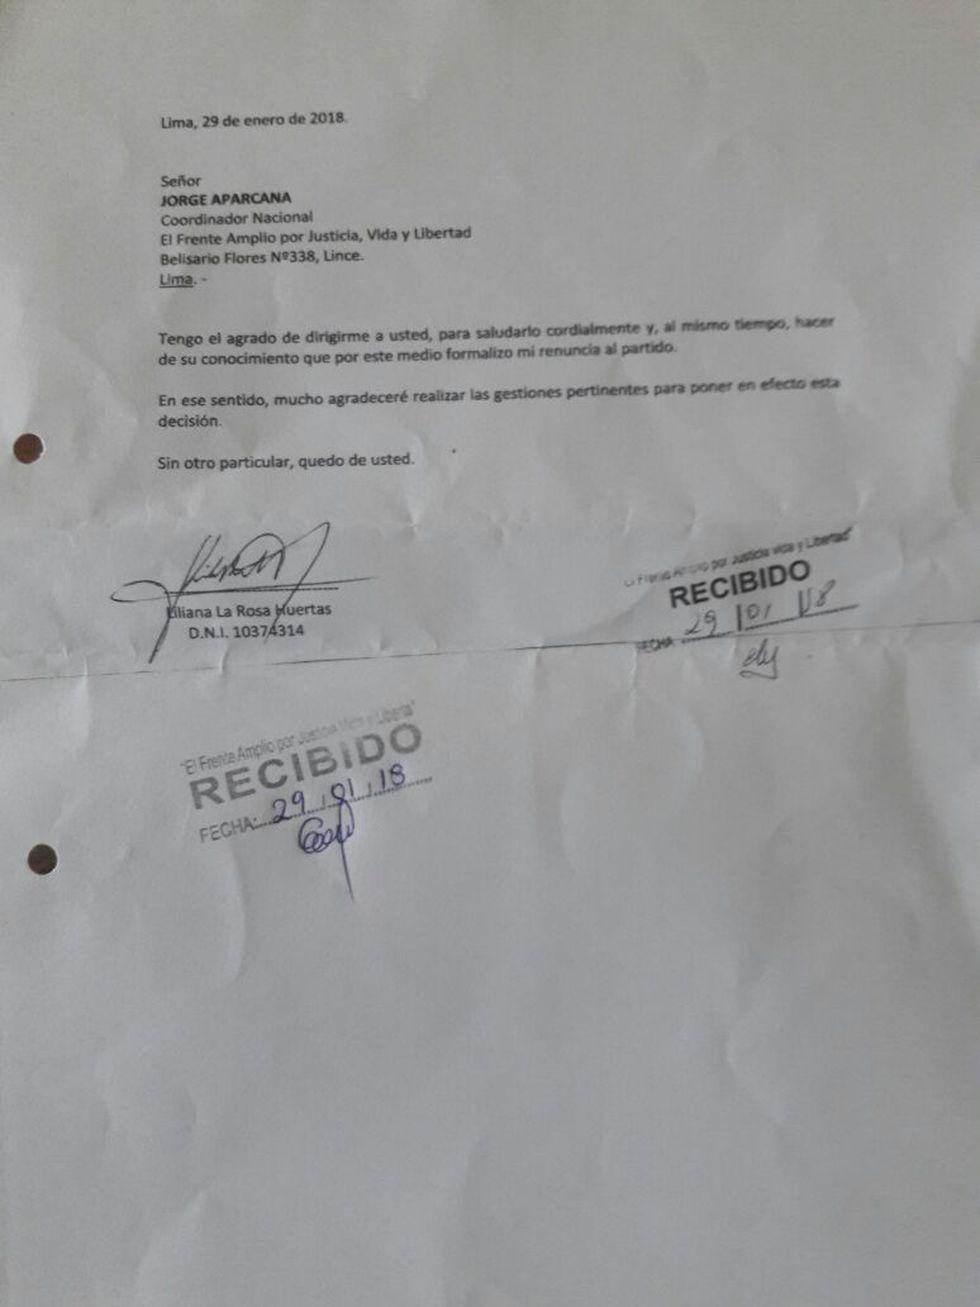 Renuncia de Liliana La Rosa al Frente Amplio.